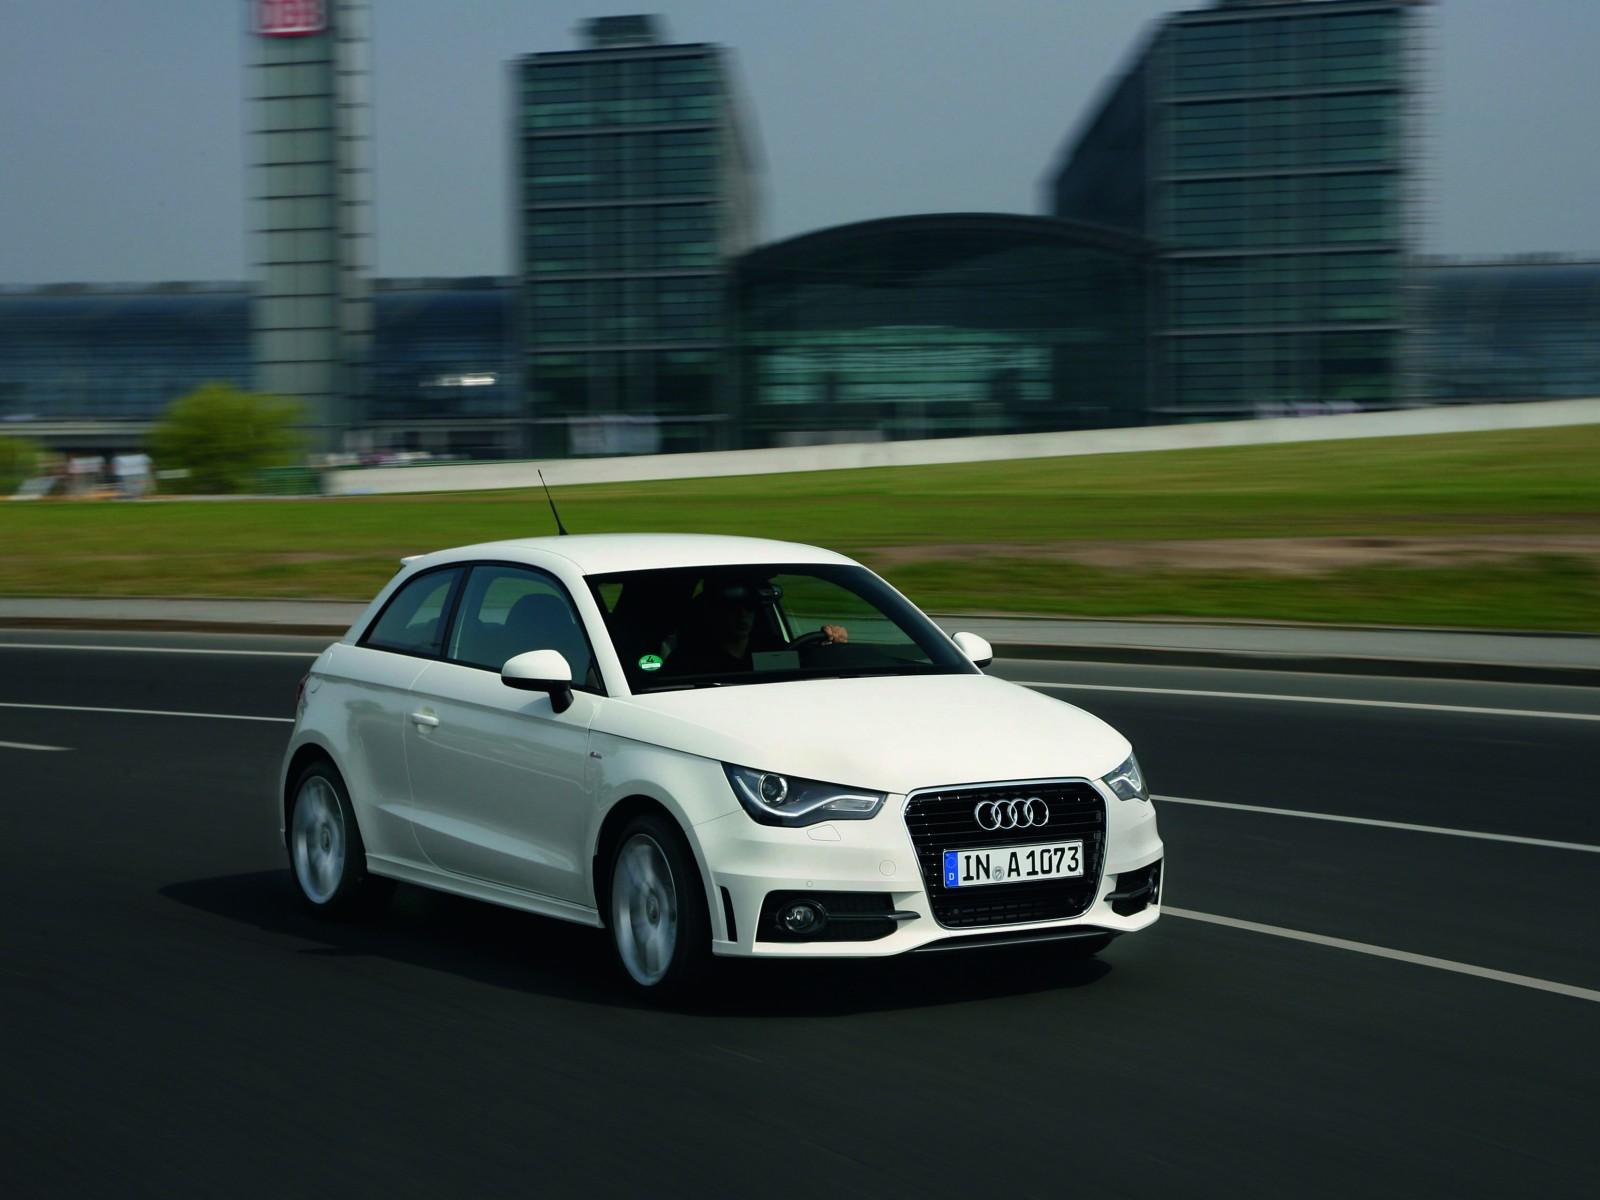 2010 Audi A1 1.4 TFSI S Line | Motor Desktop